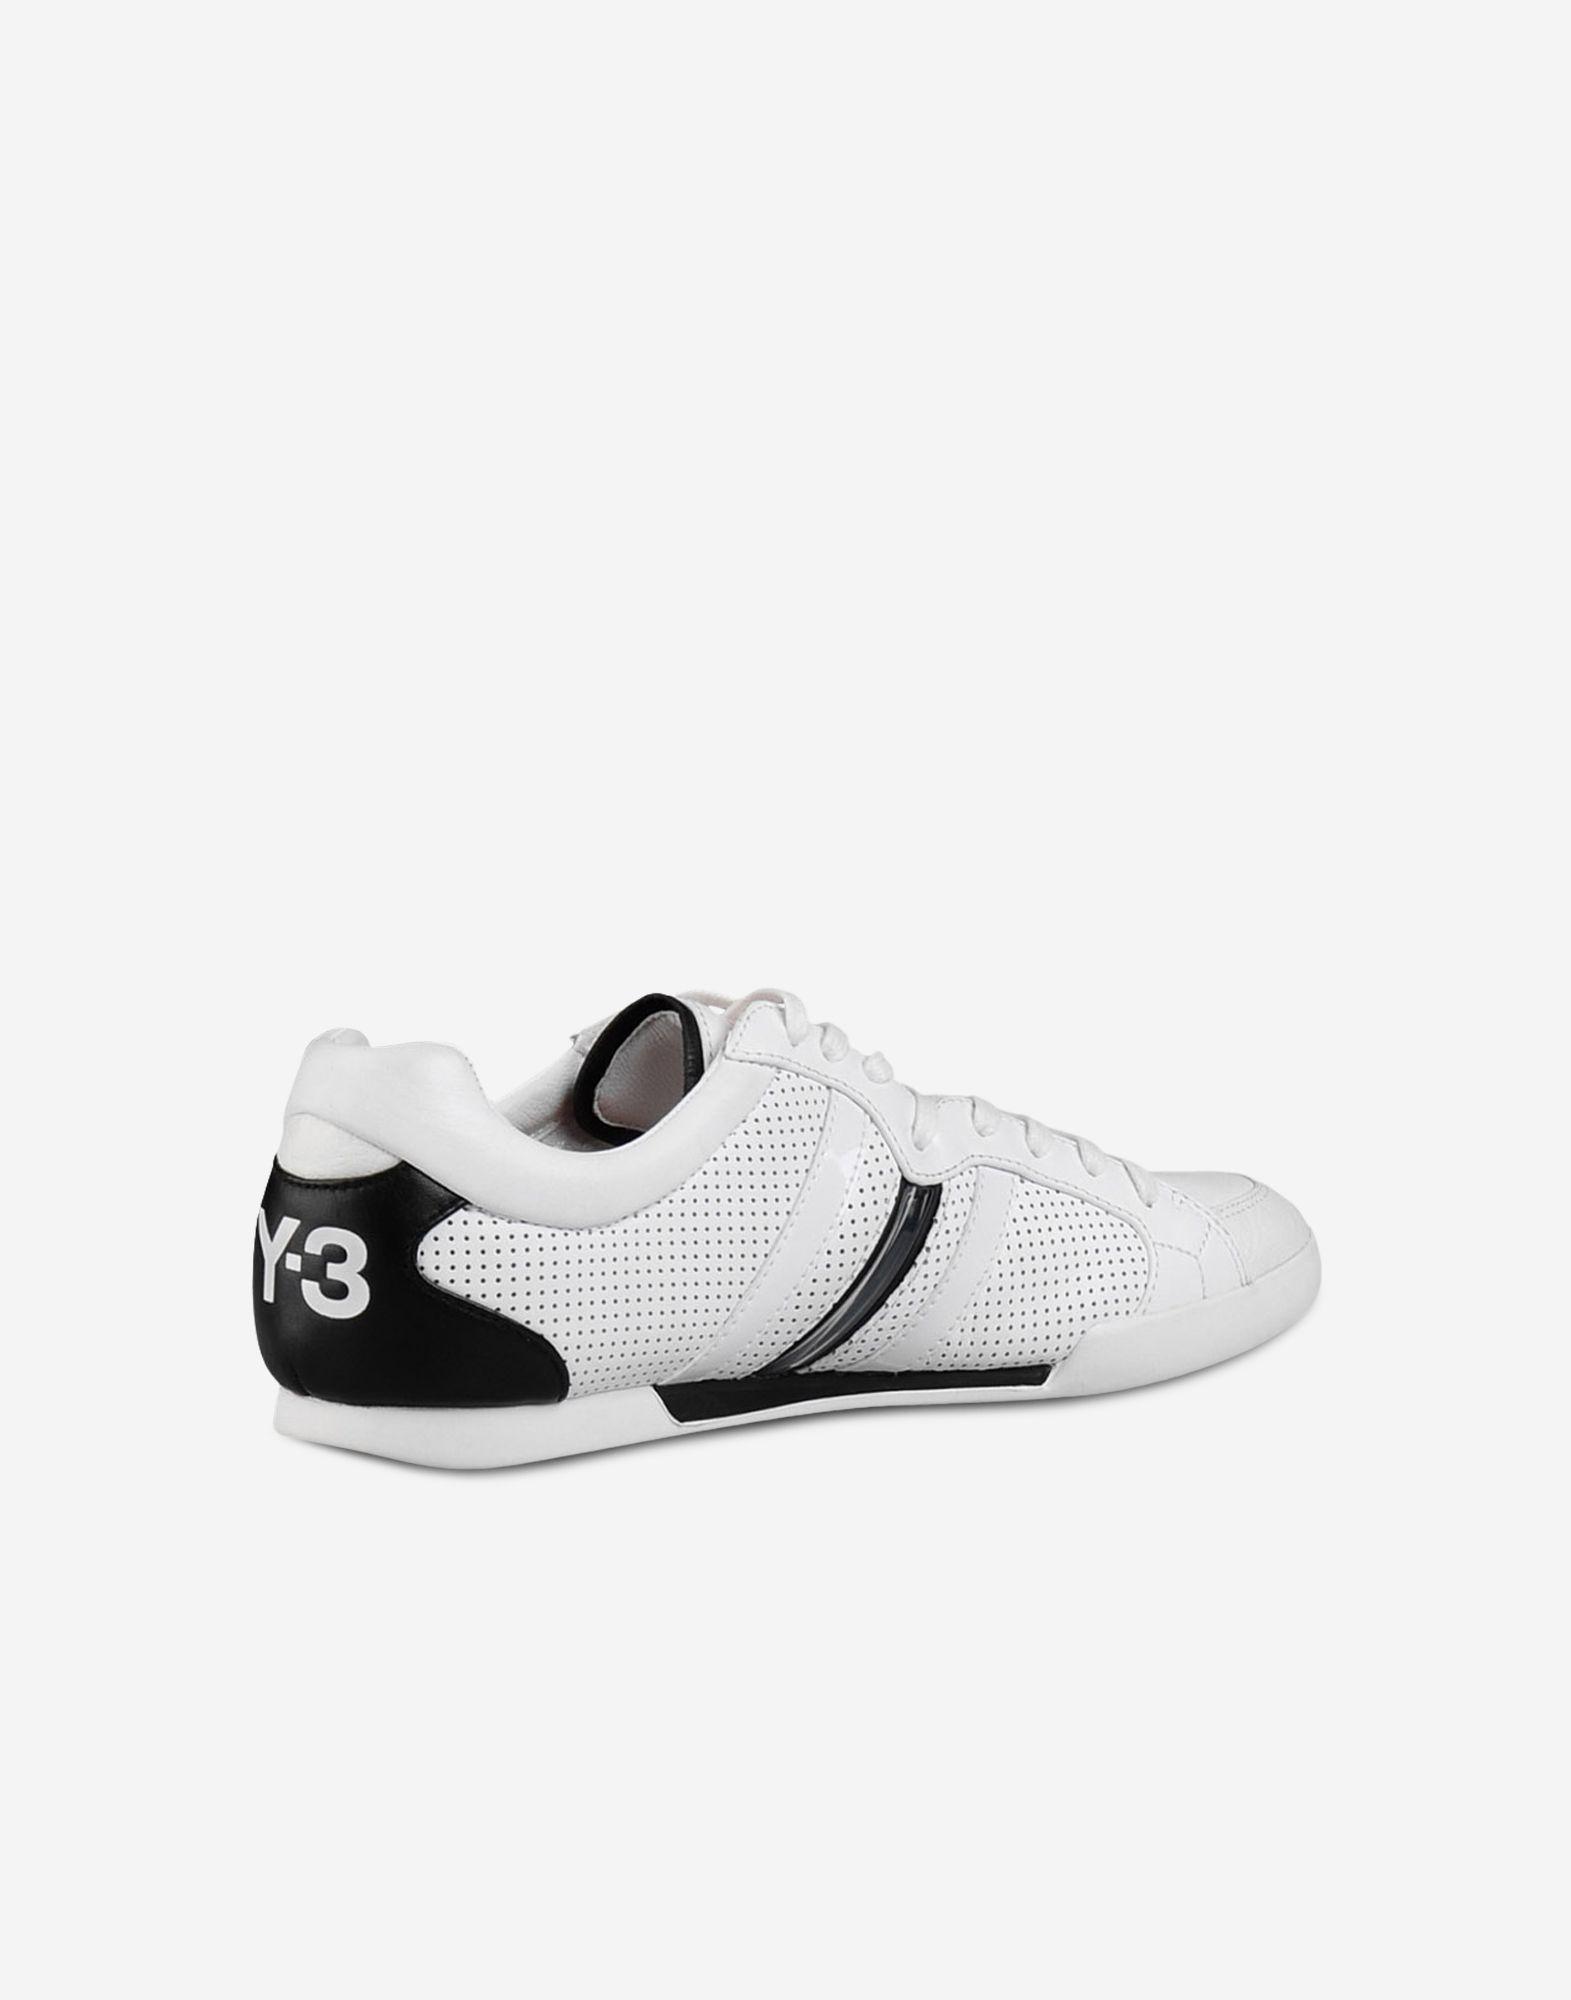 8c5bde9e5 ... Y-3 Y-3 Sala Classic 2 Sneakers Man d ...